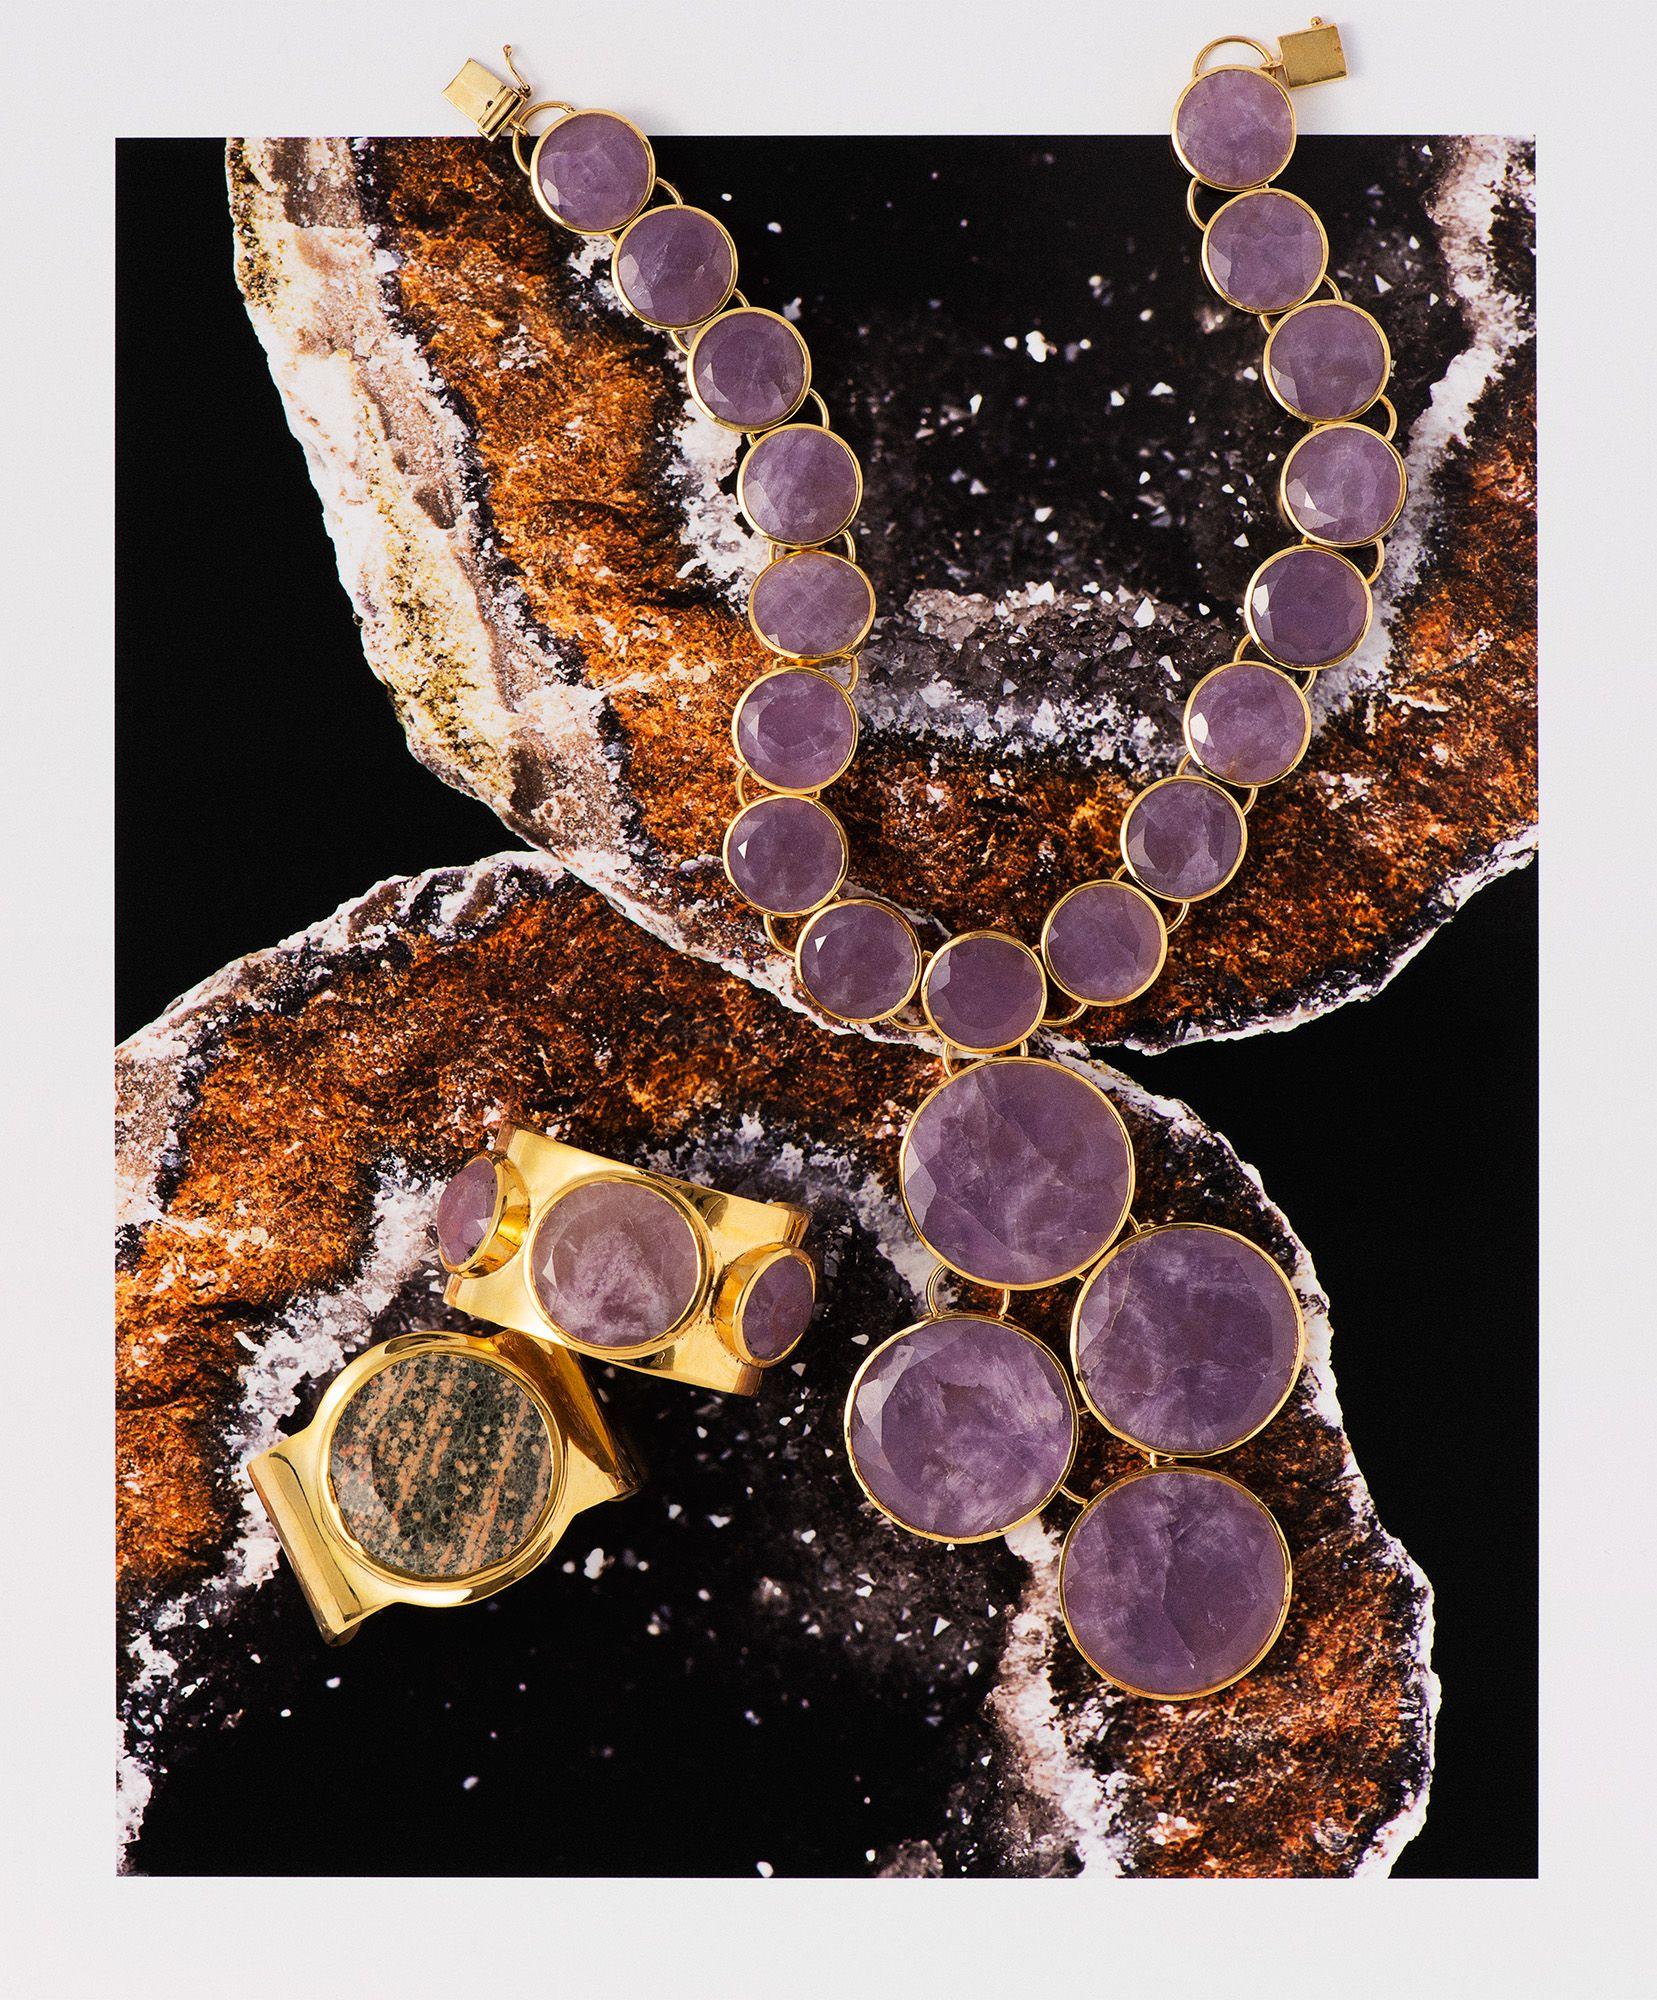 Charlotte Bonde jewelry photo by Martin Vallin